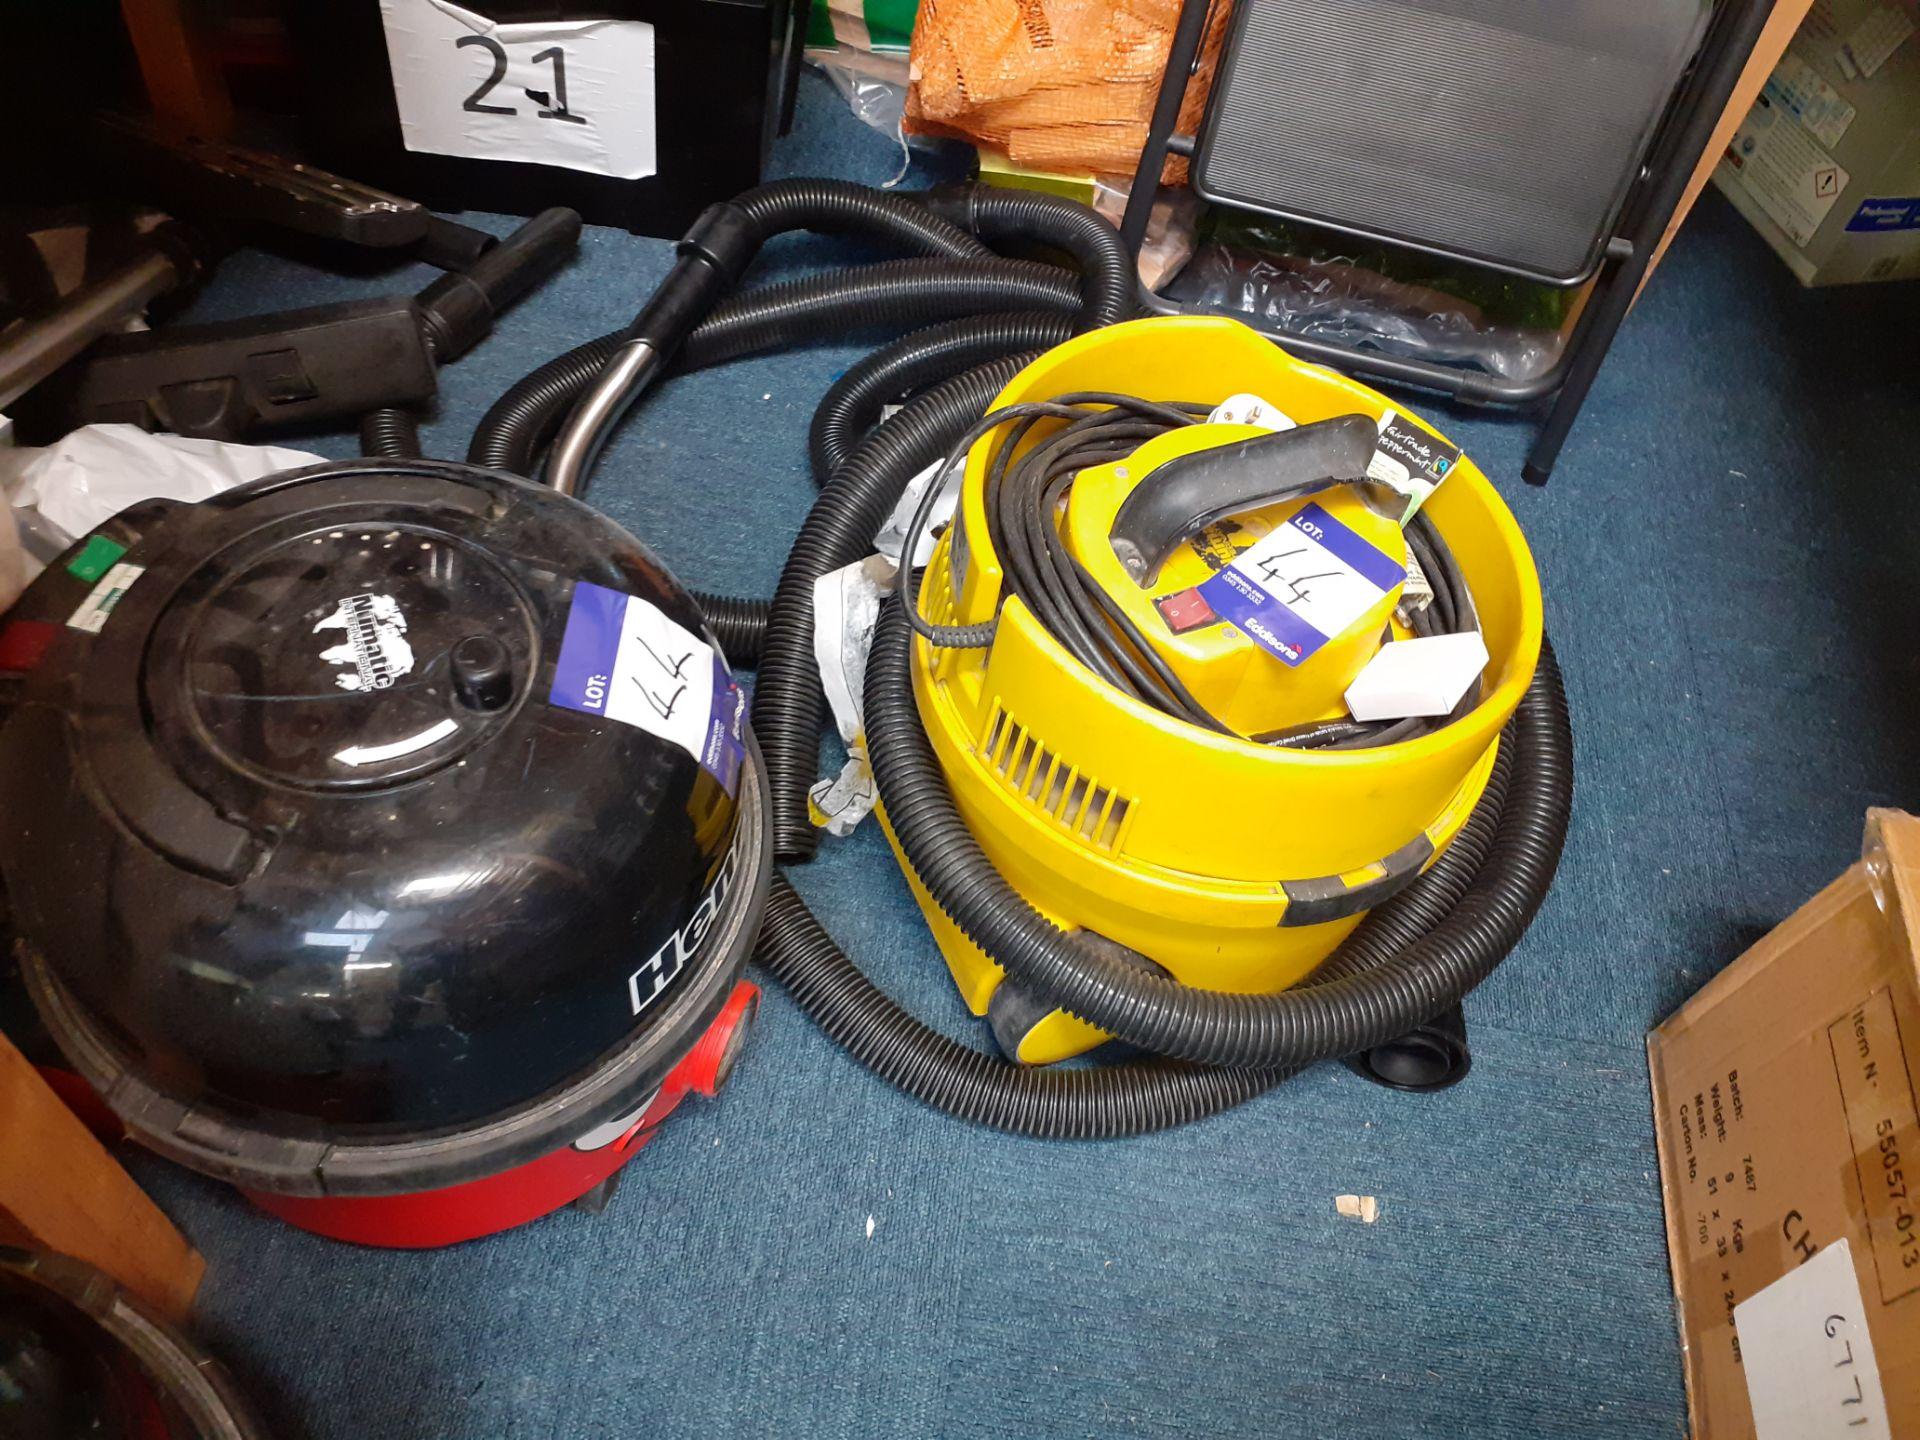 2 Numatic Henry Vacuum Cleaners, Numatic JVP-1801